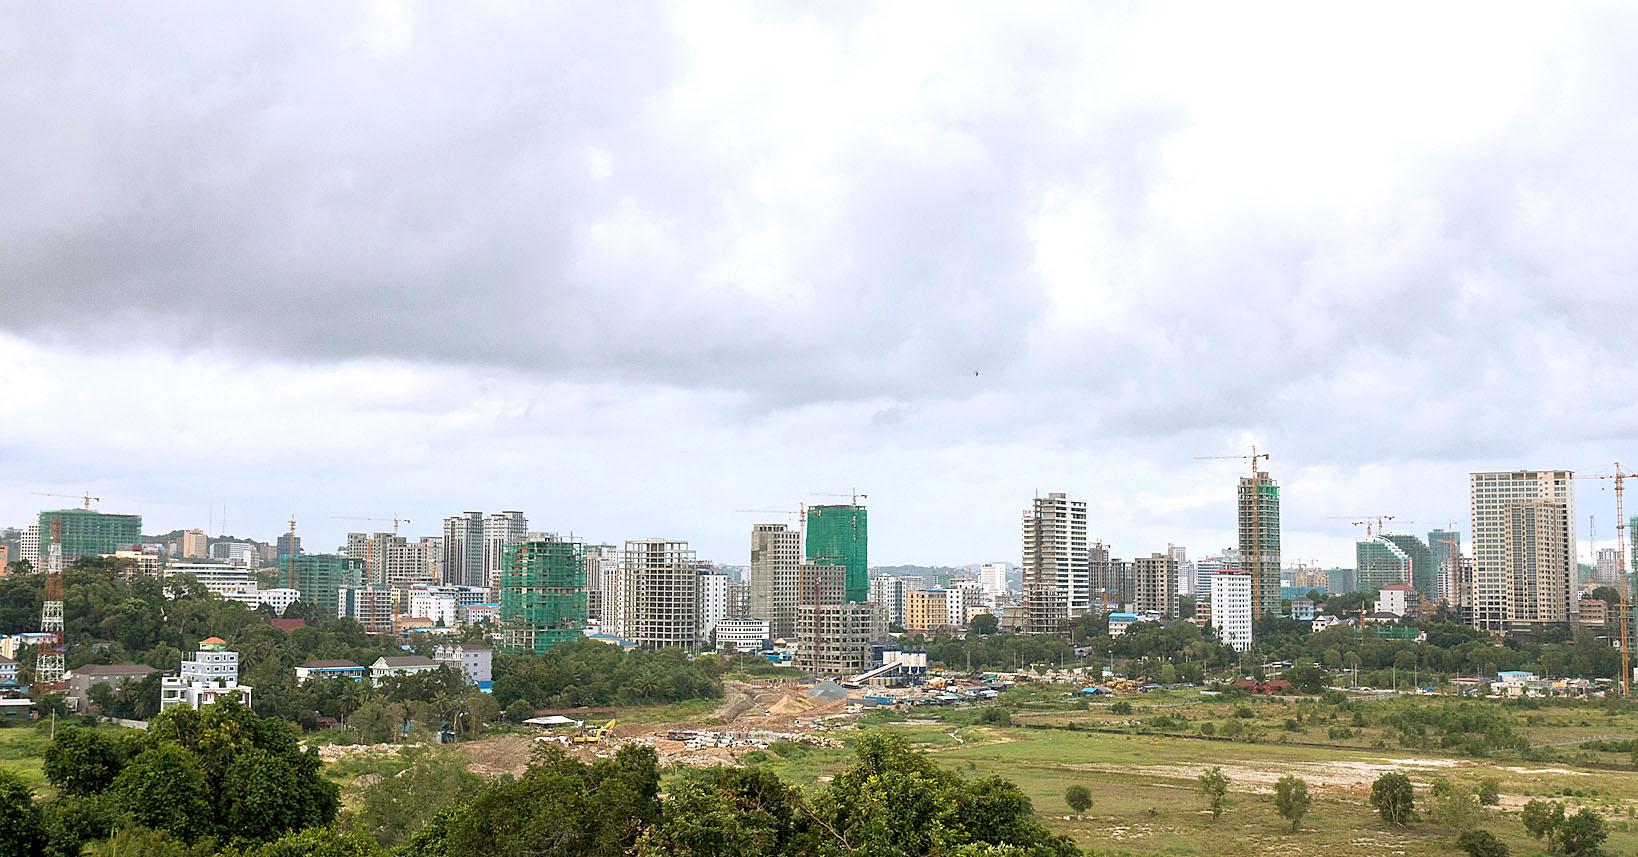 Sihanoukville August 2020 4 by Mike Gebremedhin.jpg